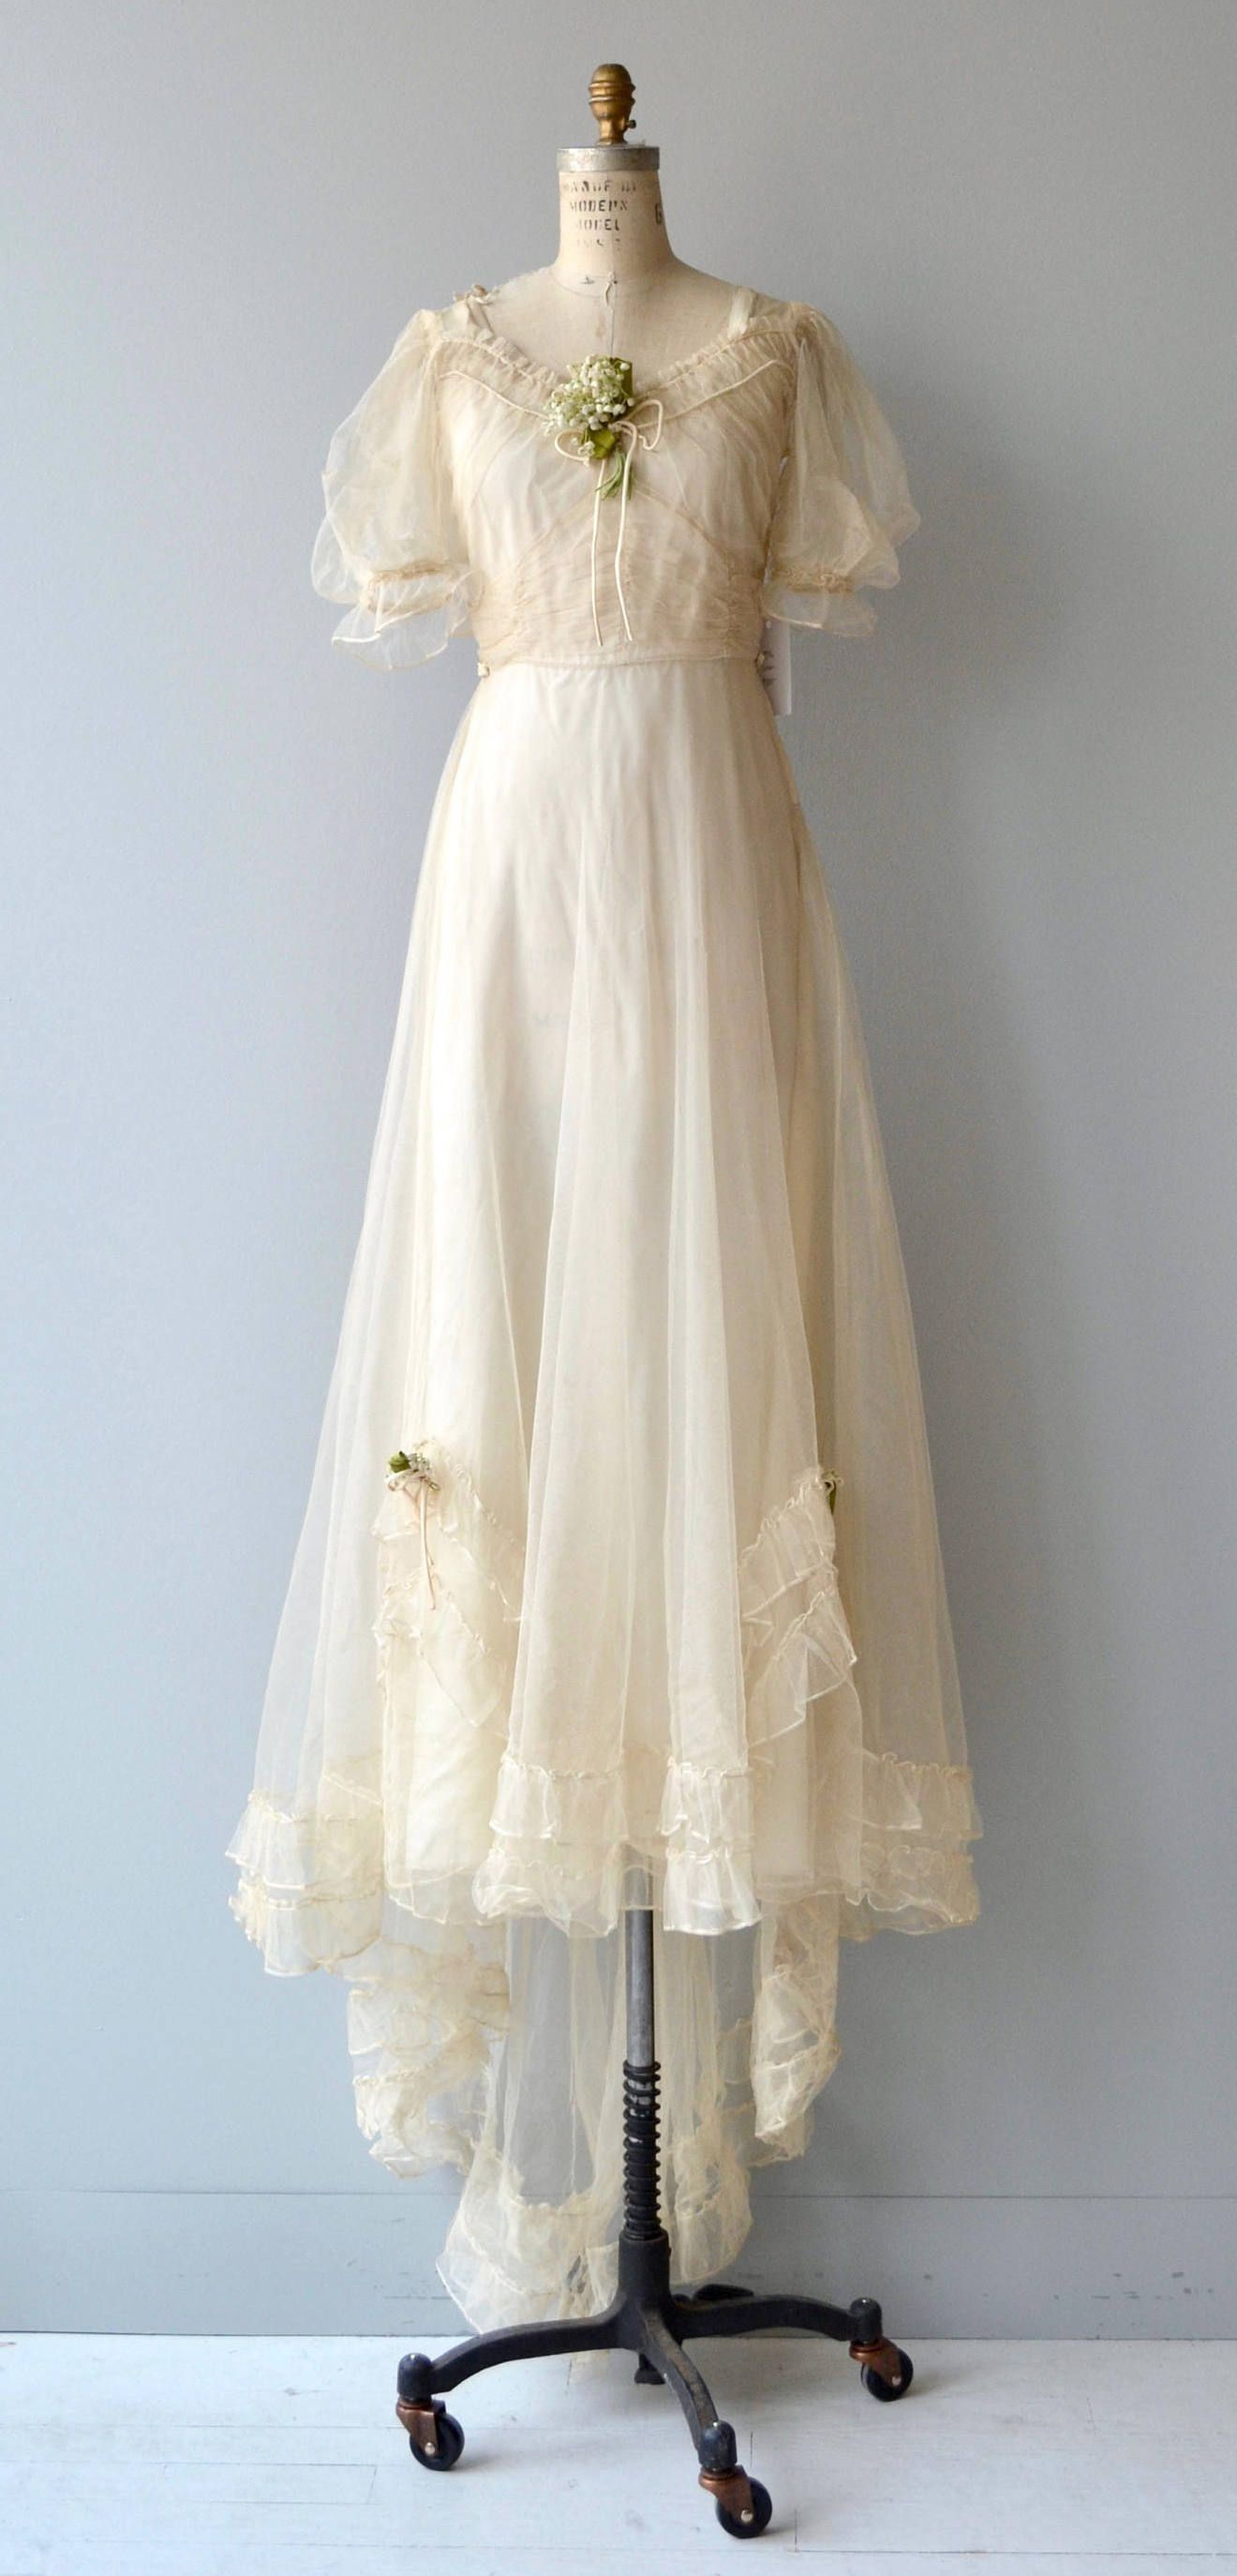 1930s wedding dress  Cantabile wedding gown  vintage s wedding dress  s wedding